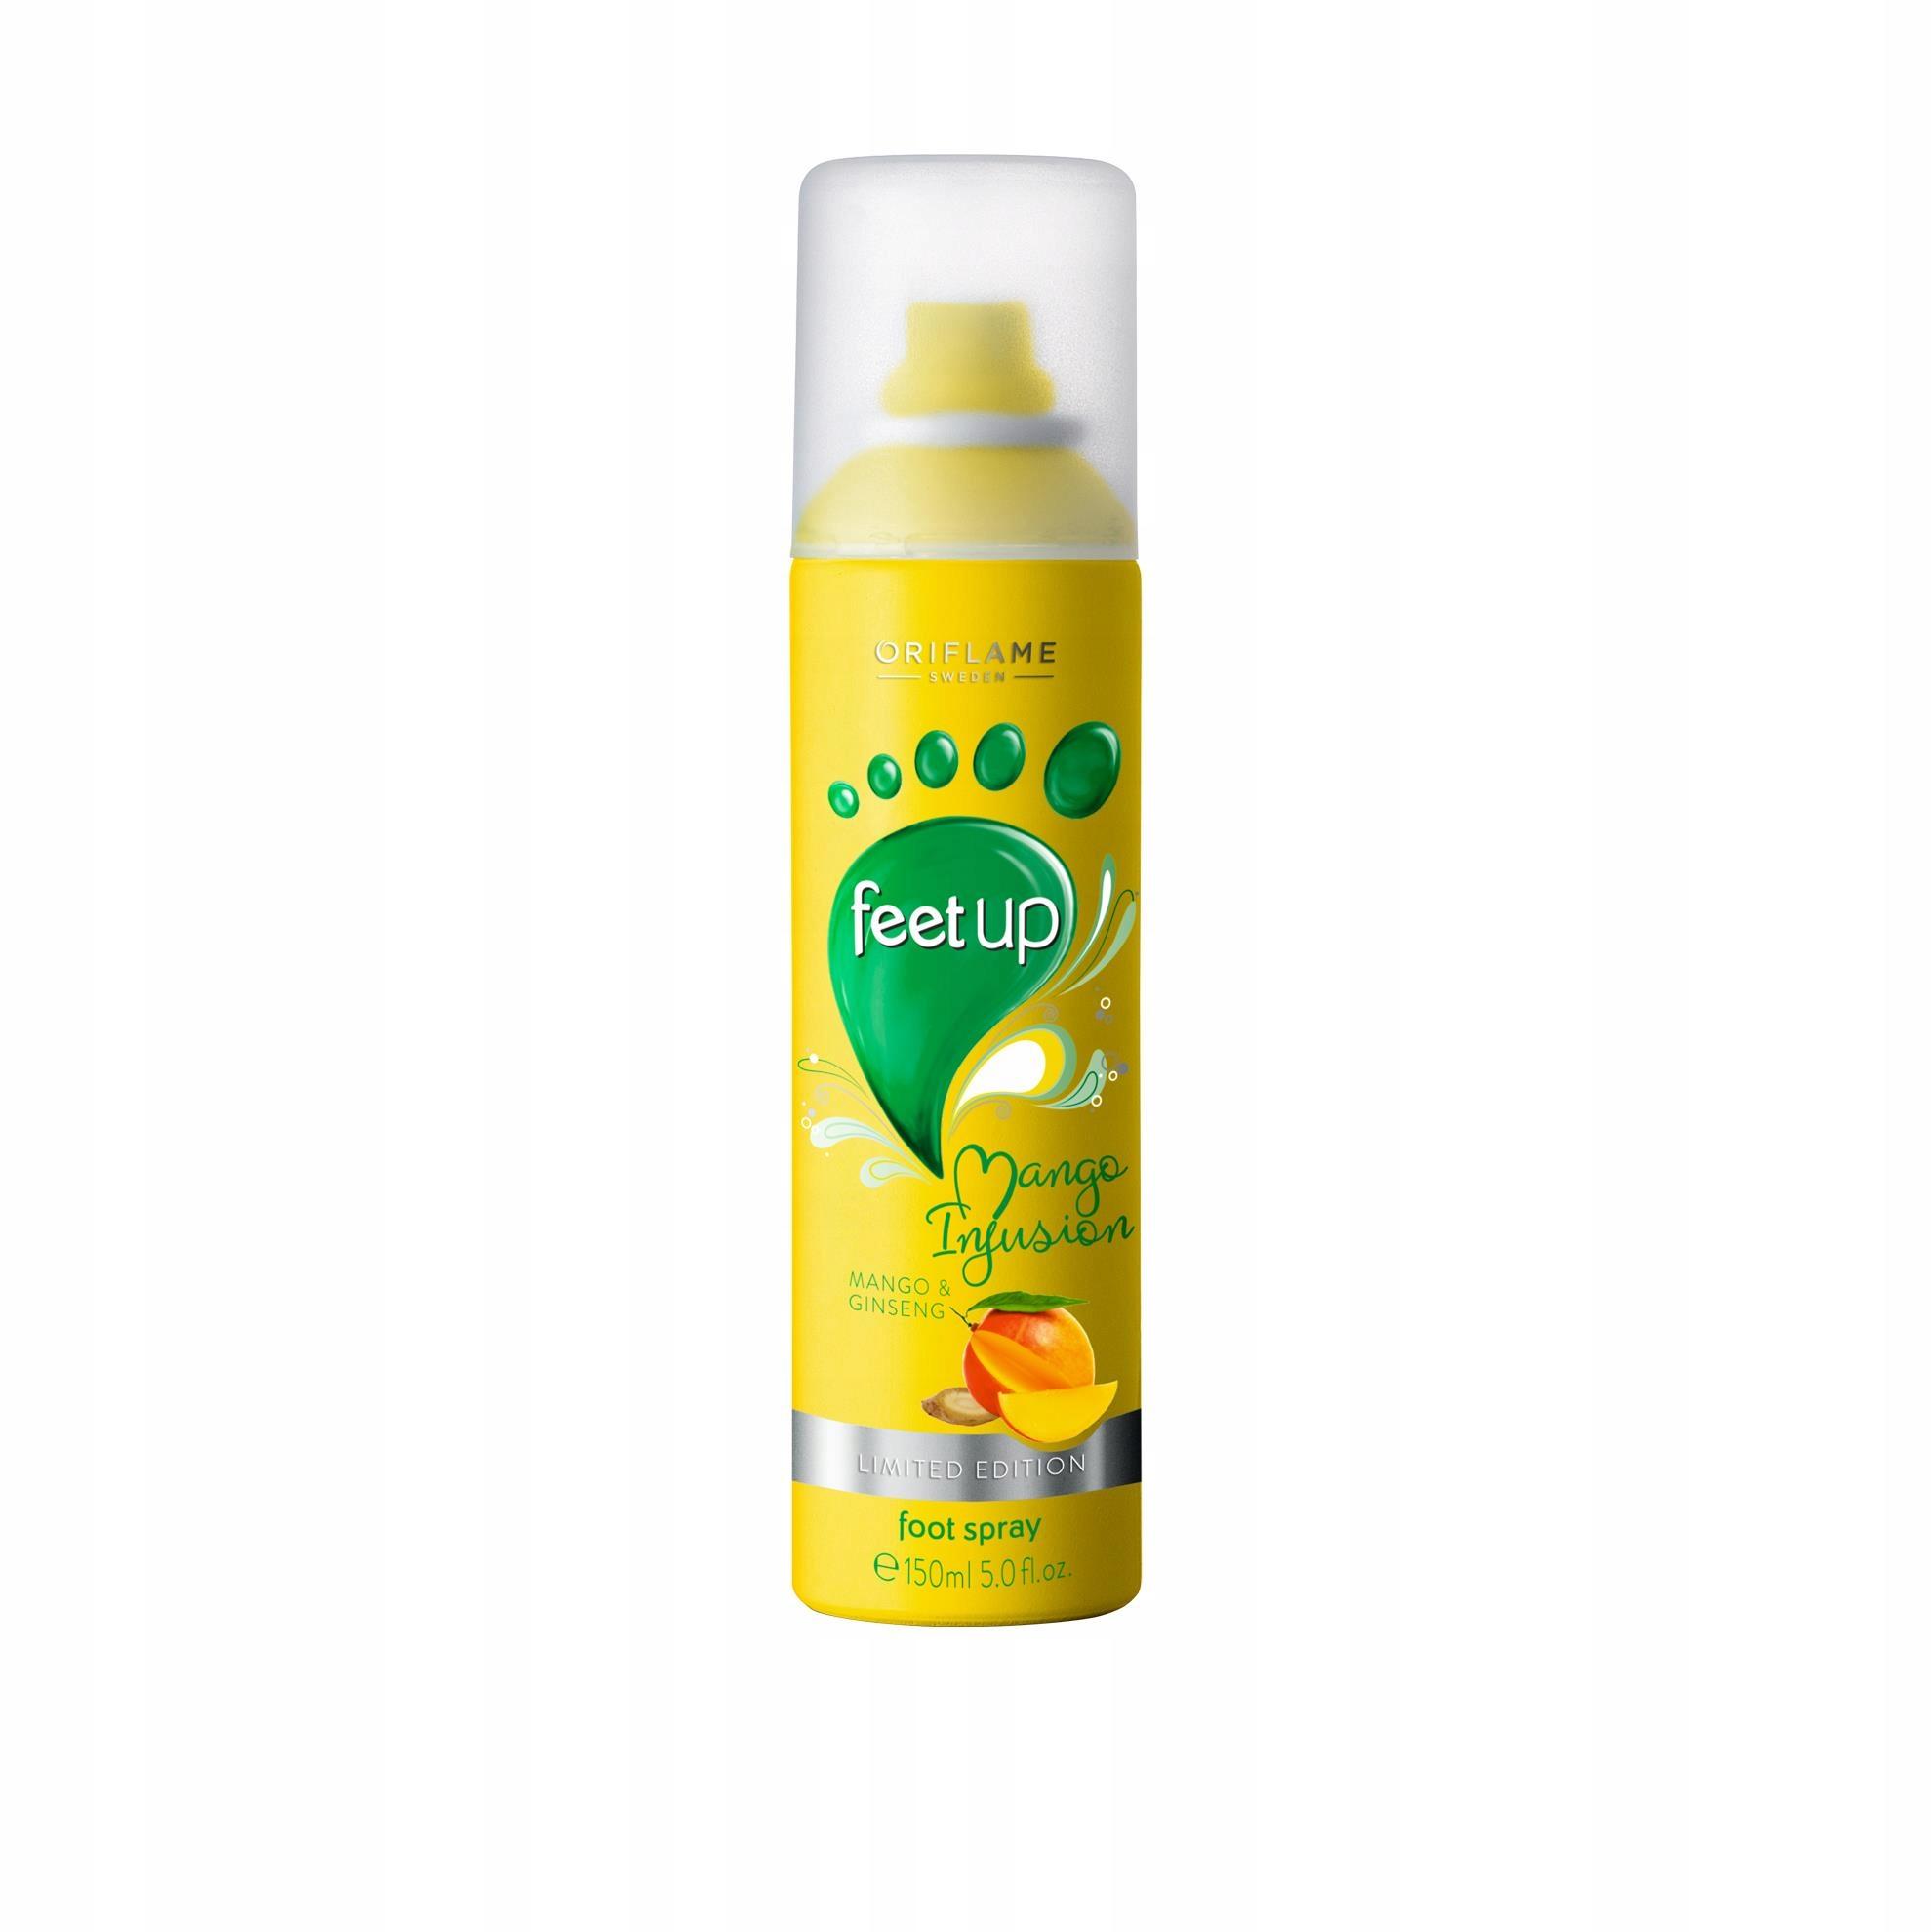 ORIFLAME- Spray do stóp Feet Up Mango Infusion